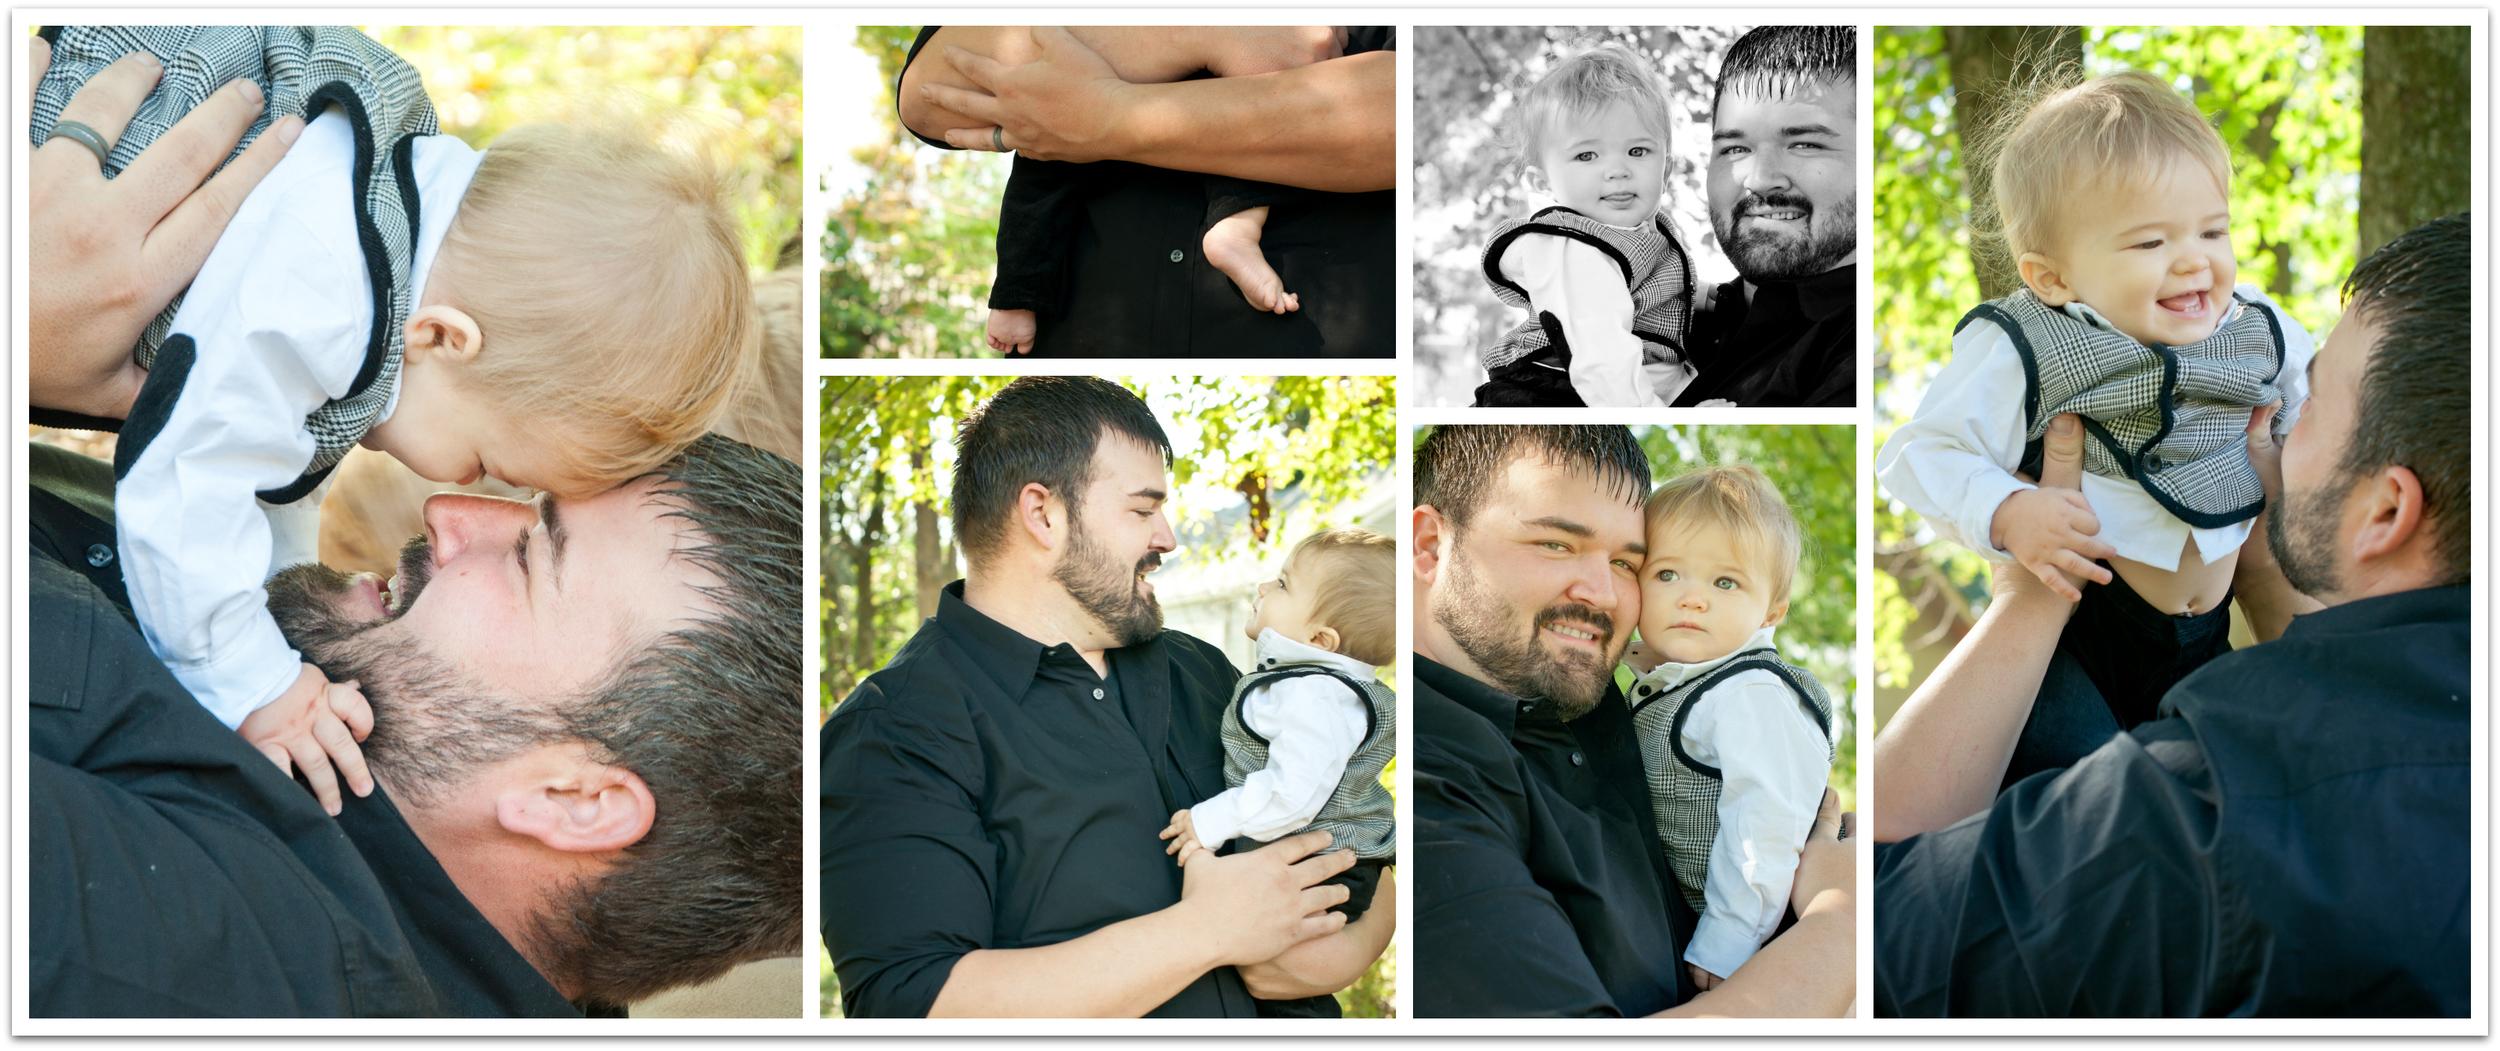 PicMonkey Collage5.jpg